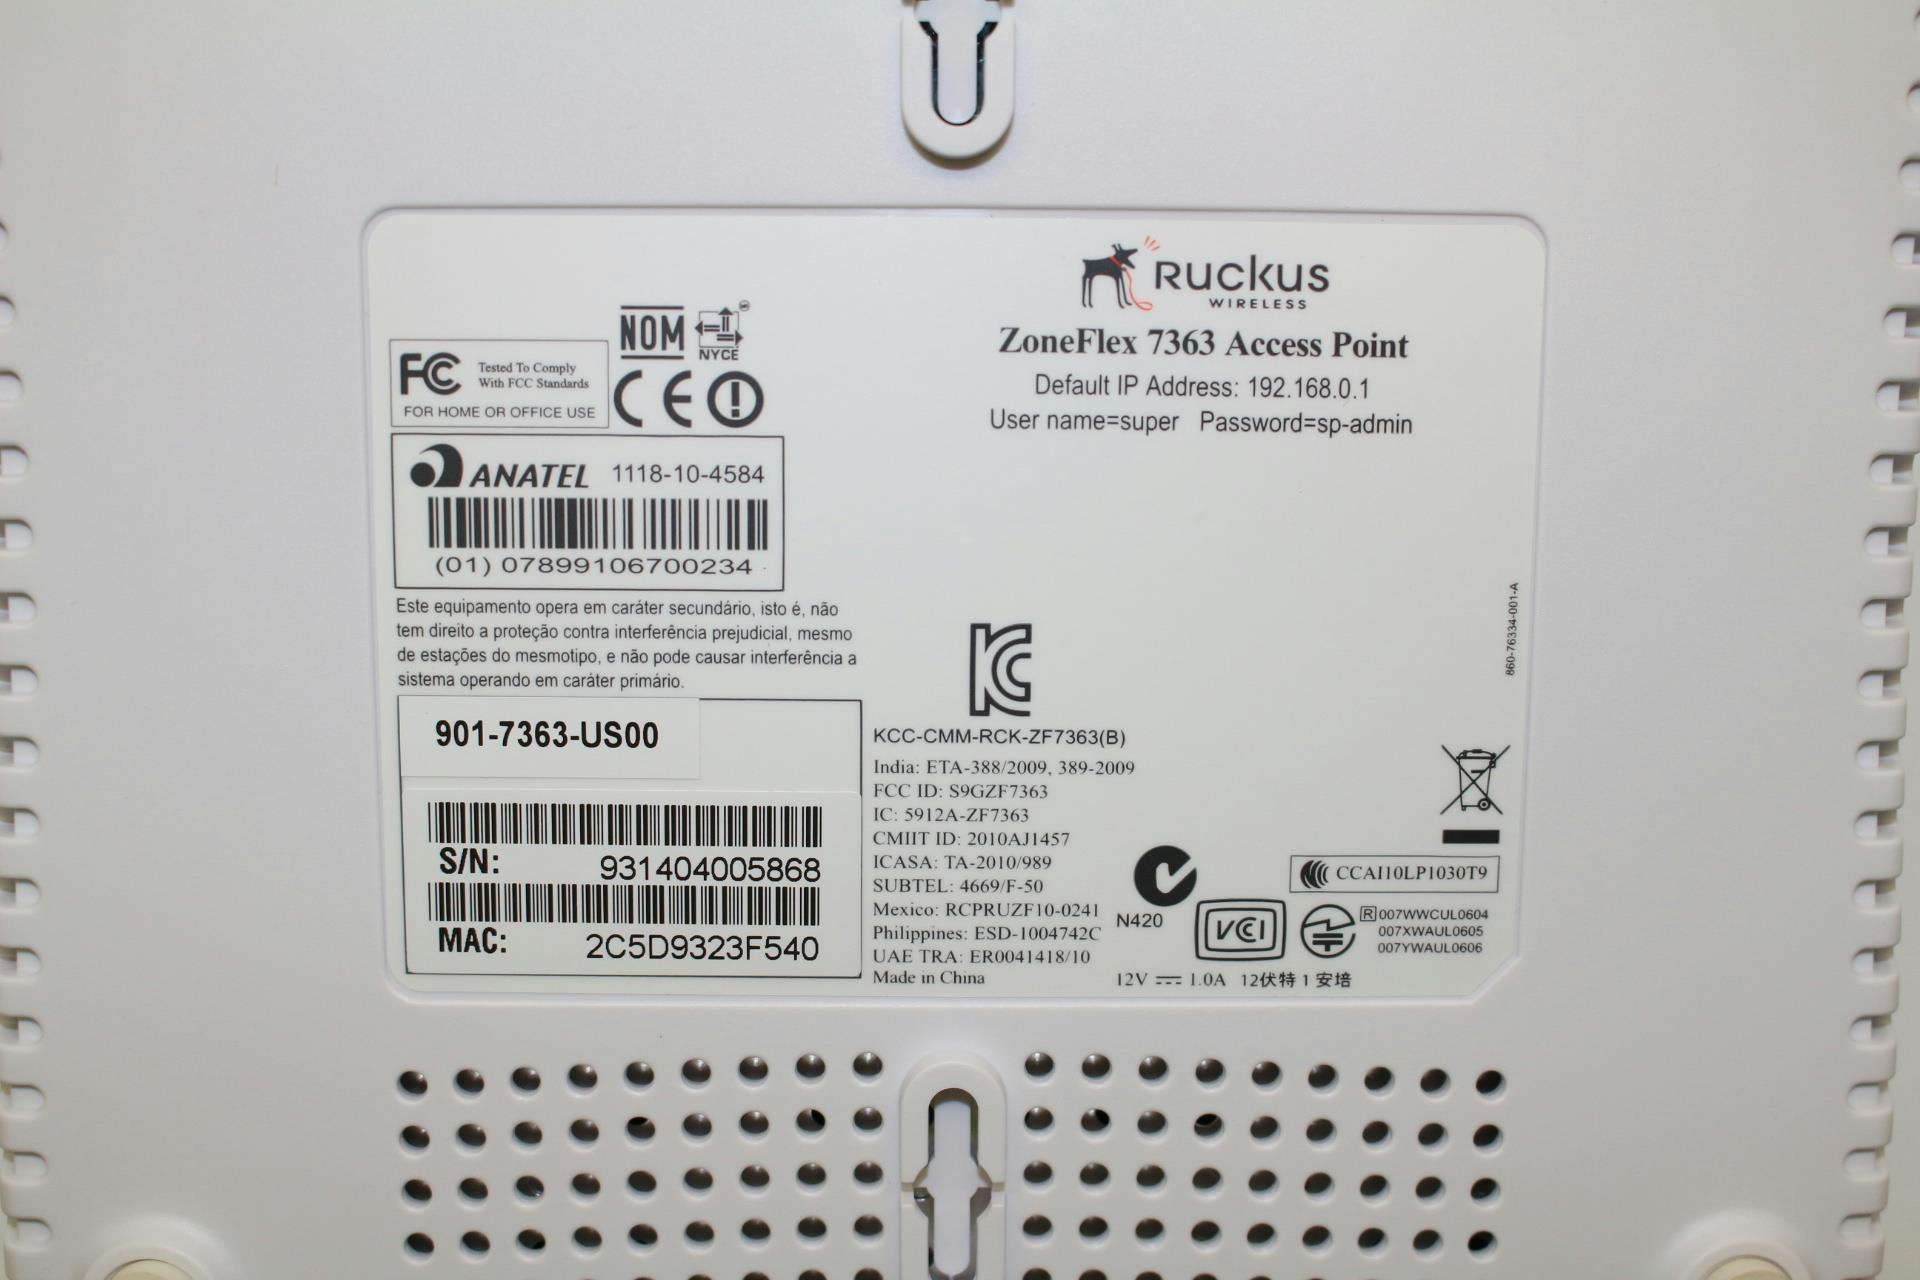 Ruckus 901 7363 US00 ZoneFlex 7363 wireless access